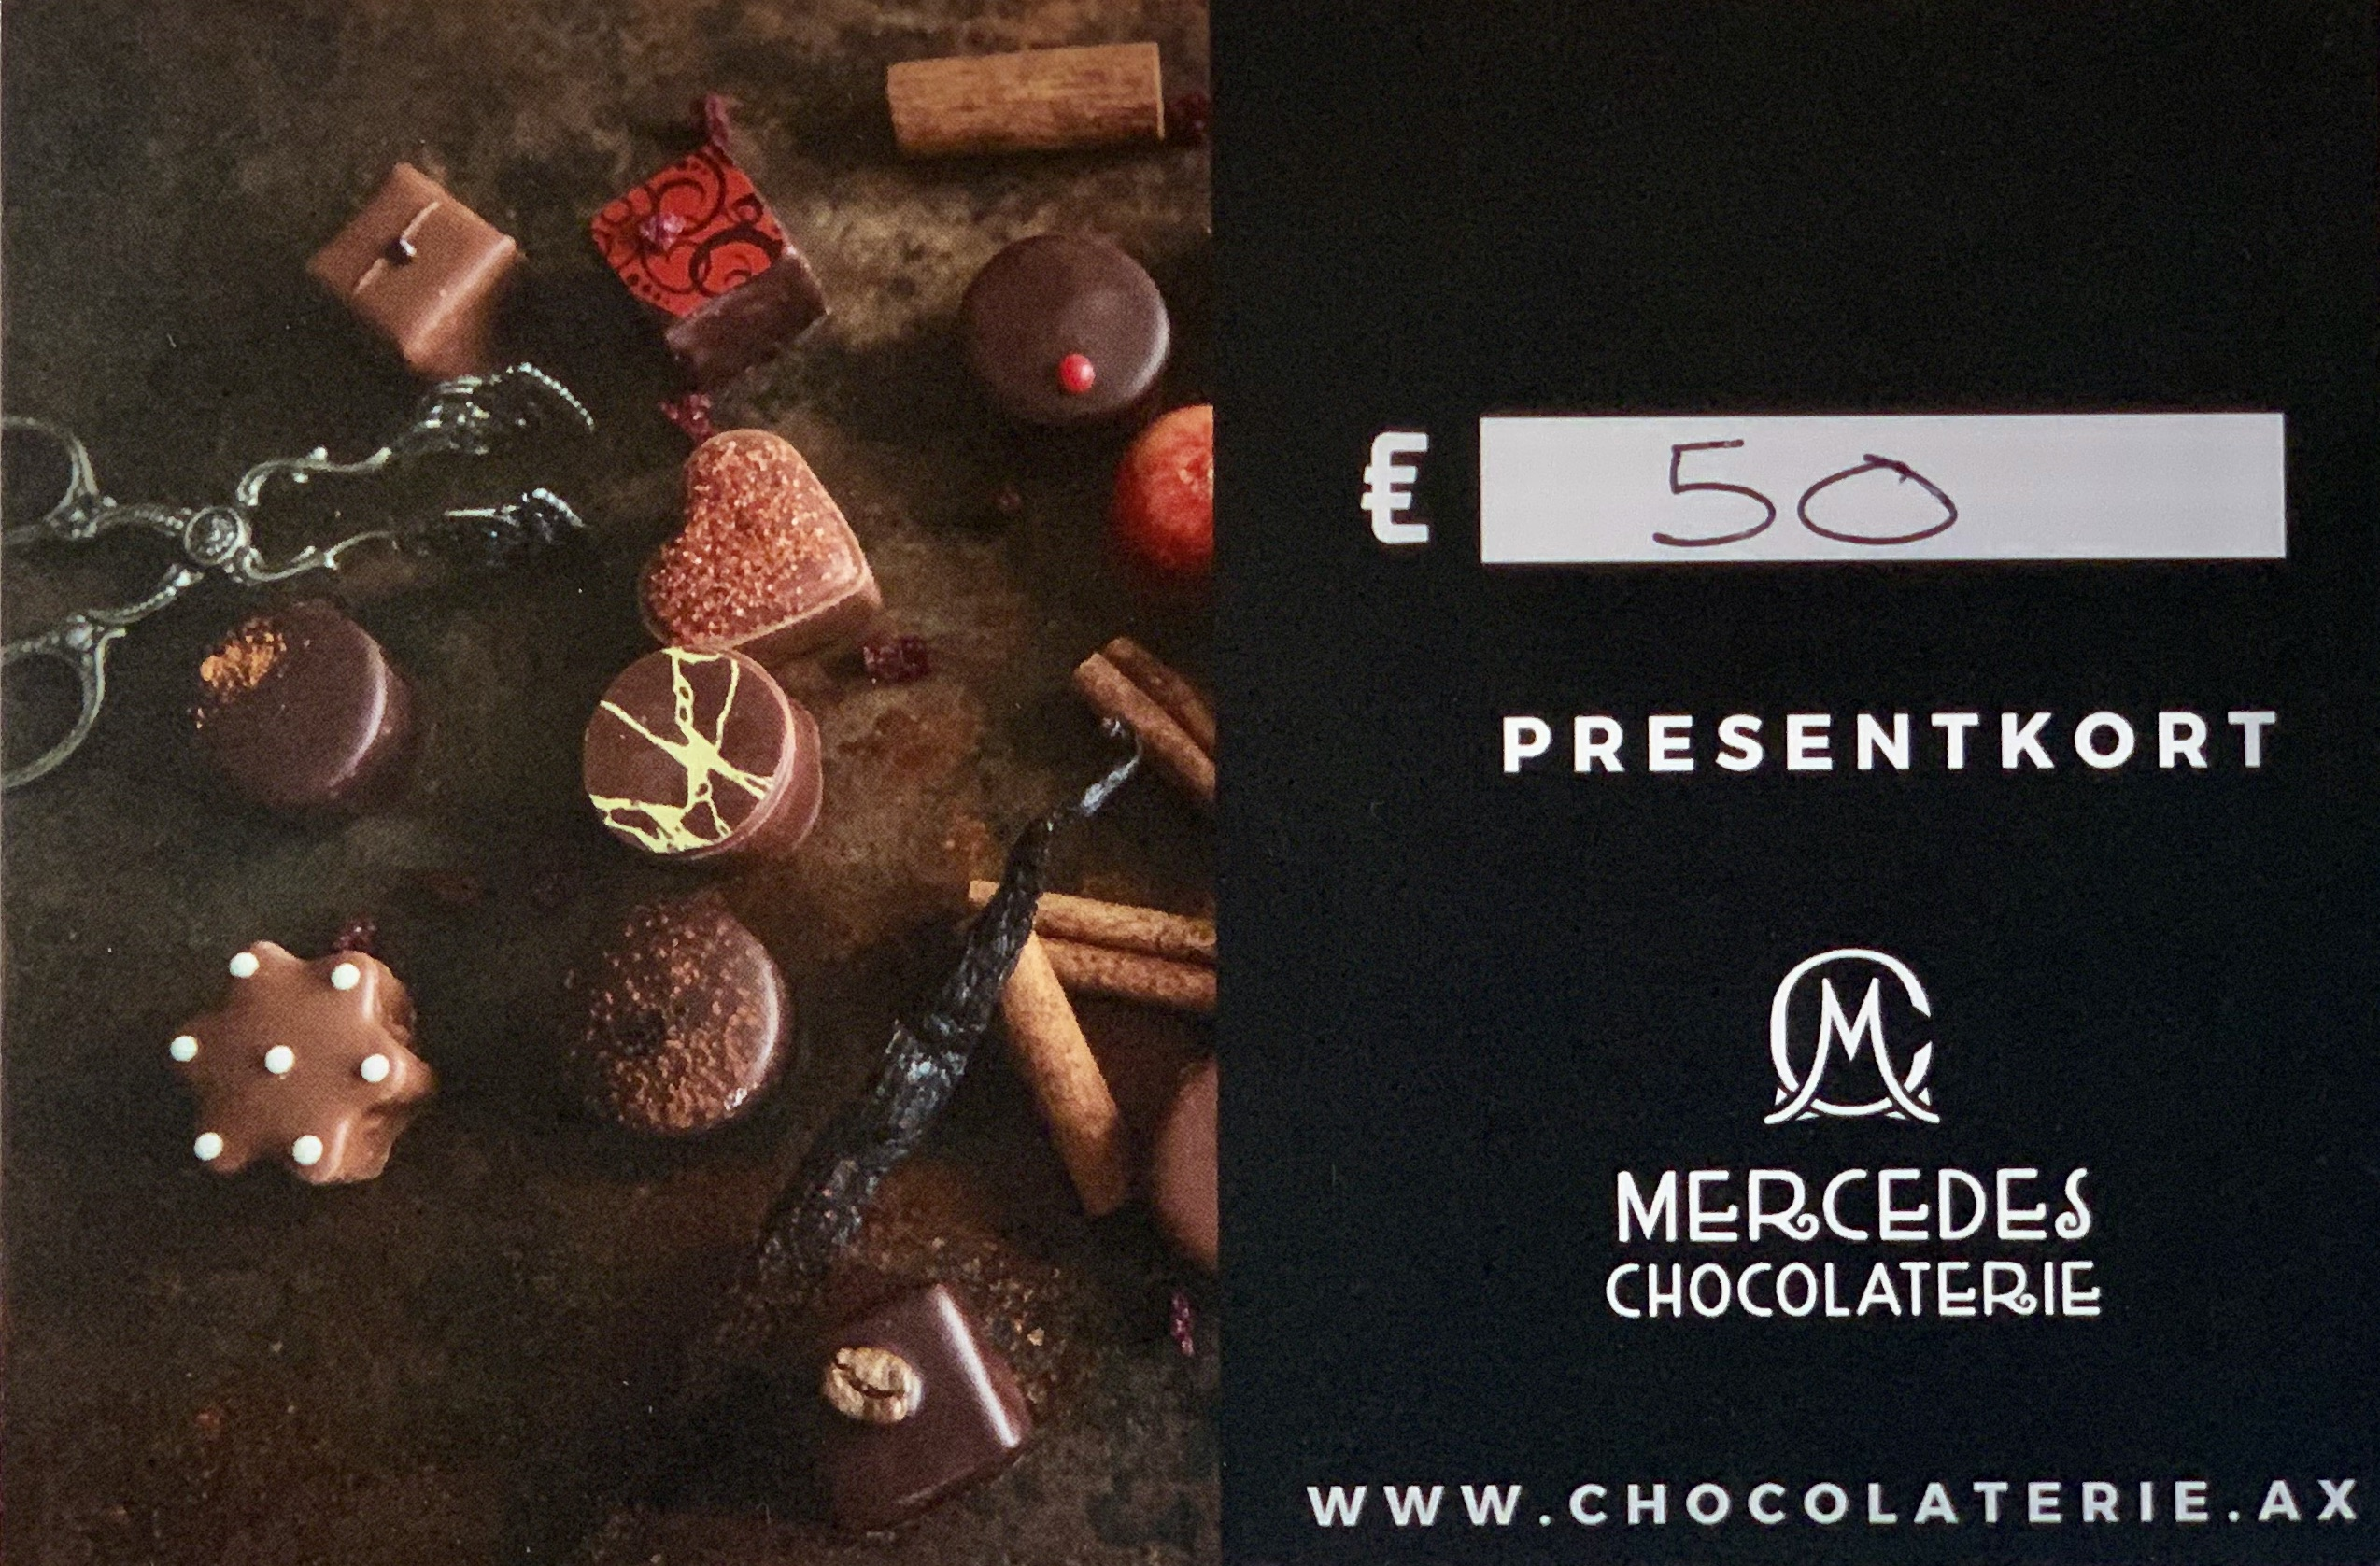 Mercedes presentkort, 50 euro